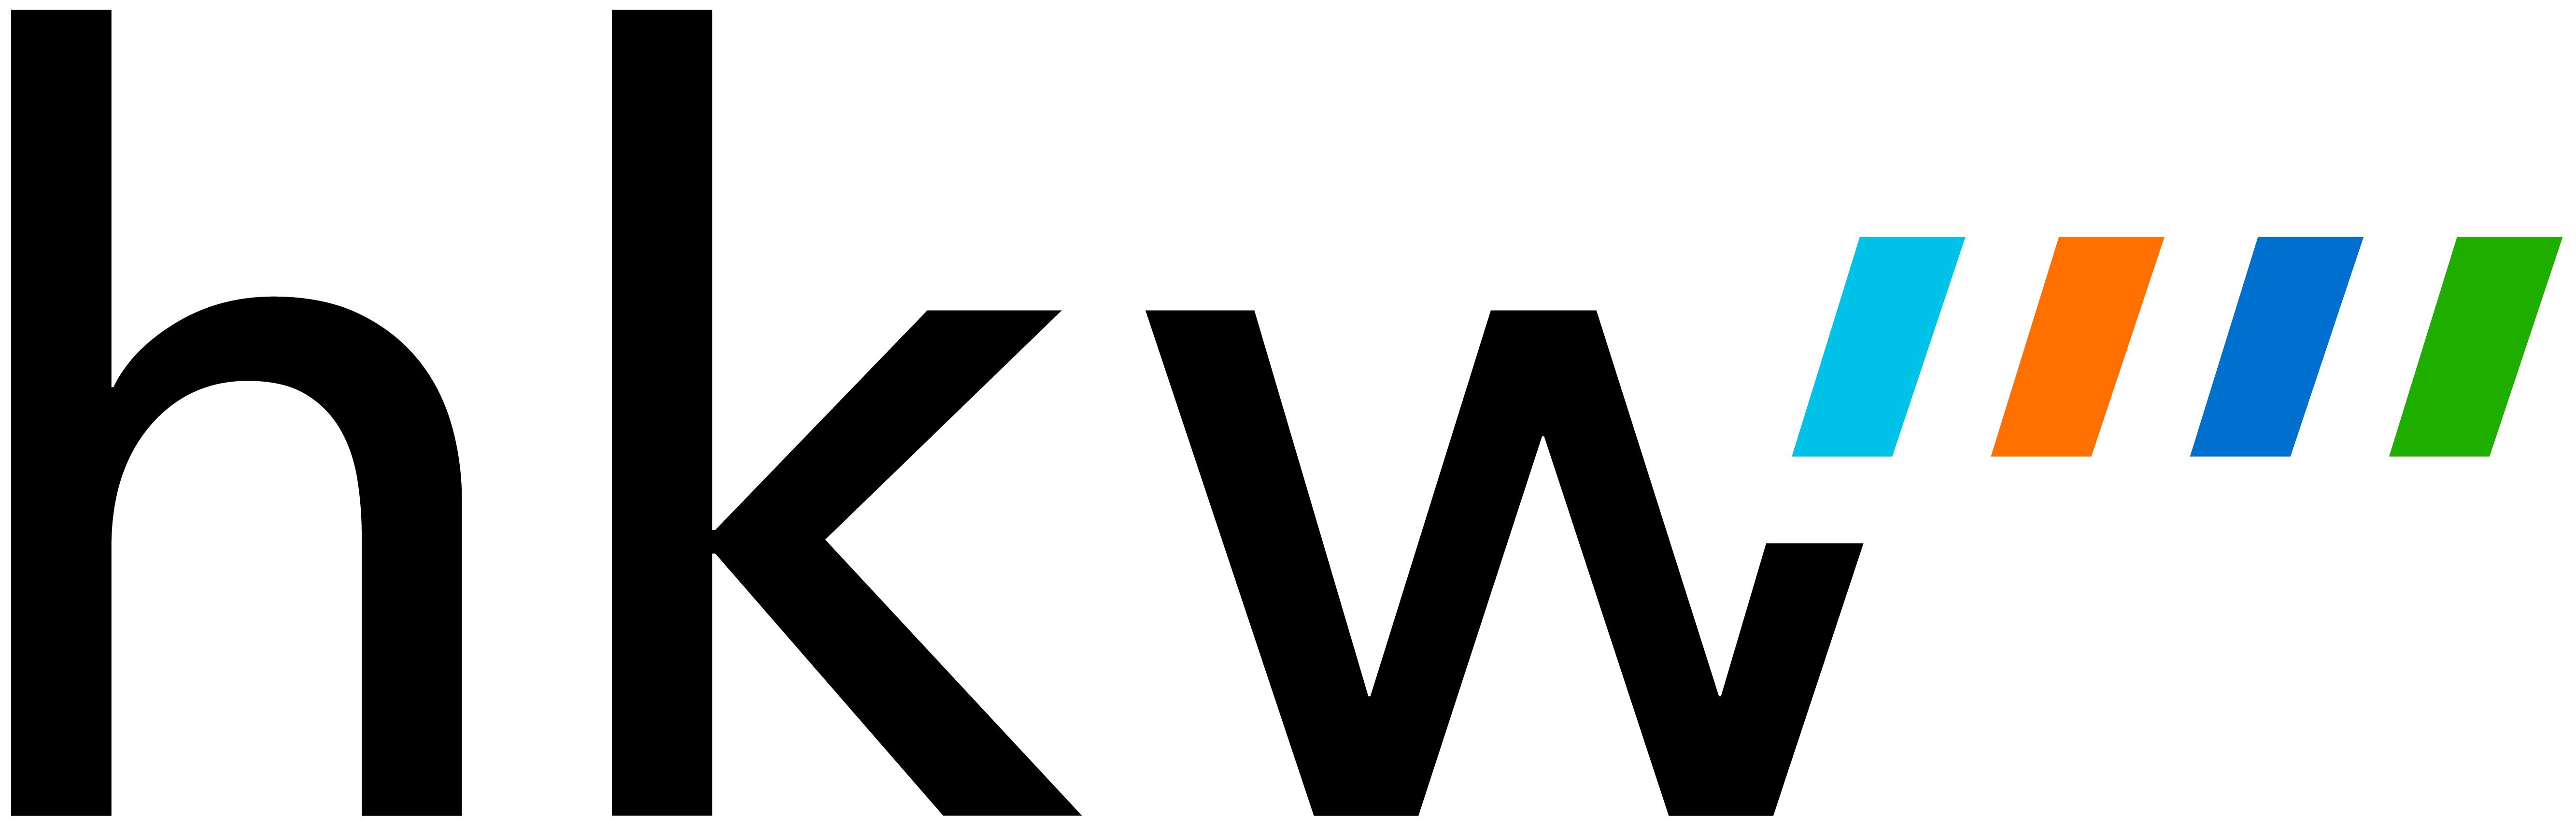 Hkw S Xirgo Technologies Acquires Owlcam Assets Consumer Electronics Net